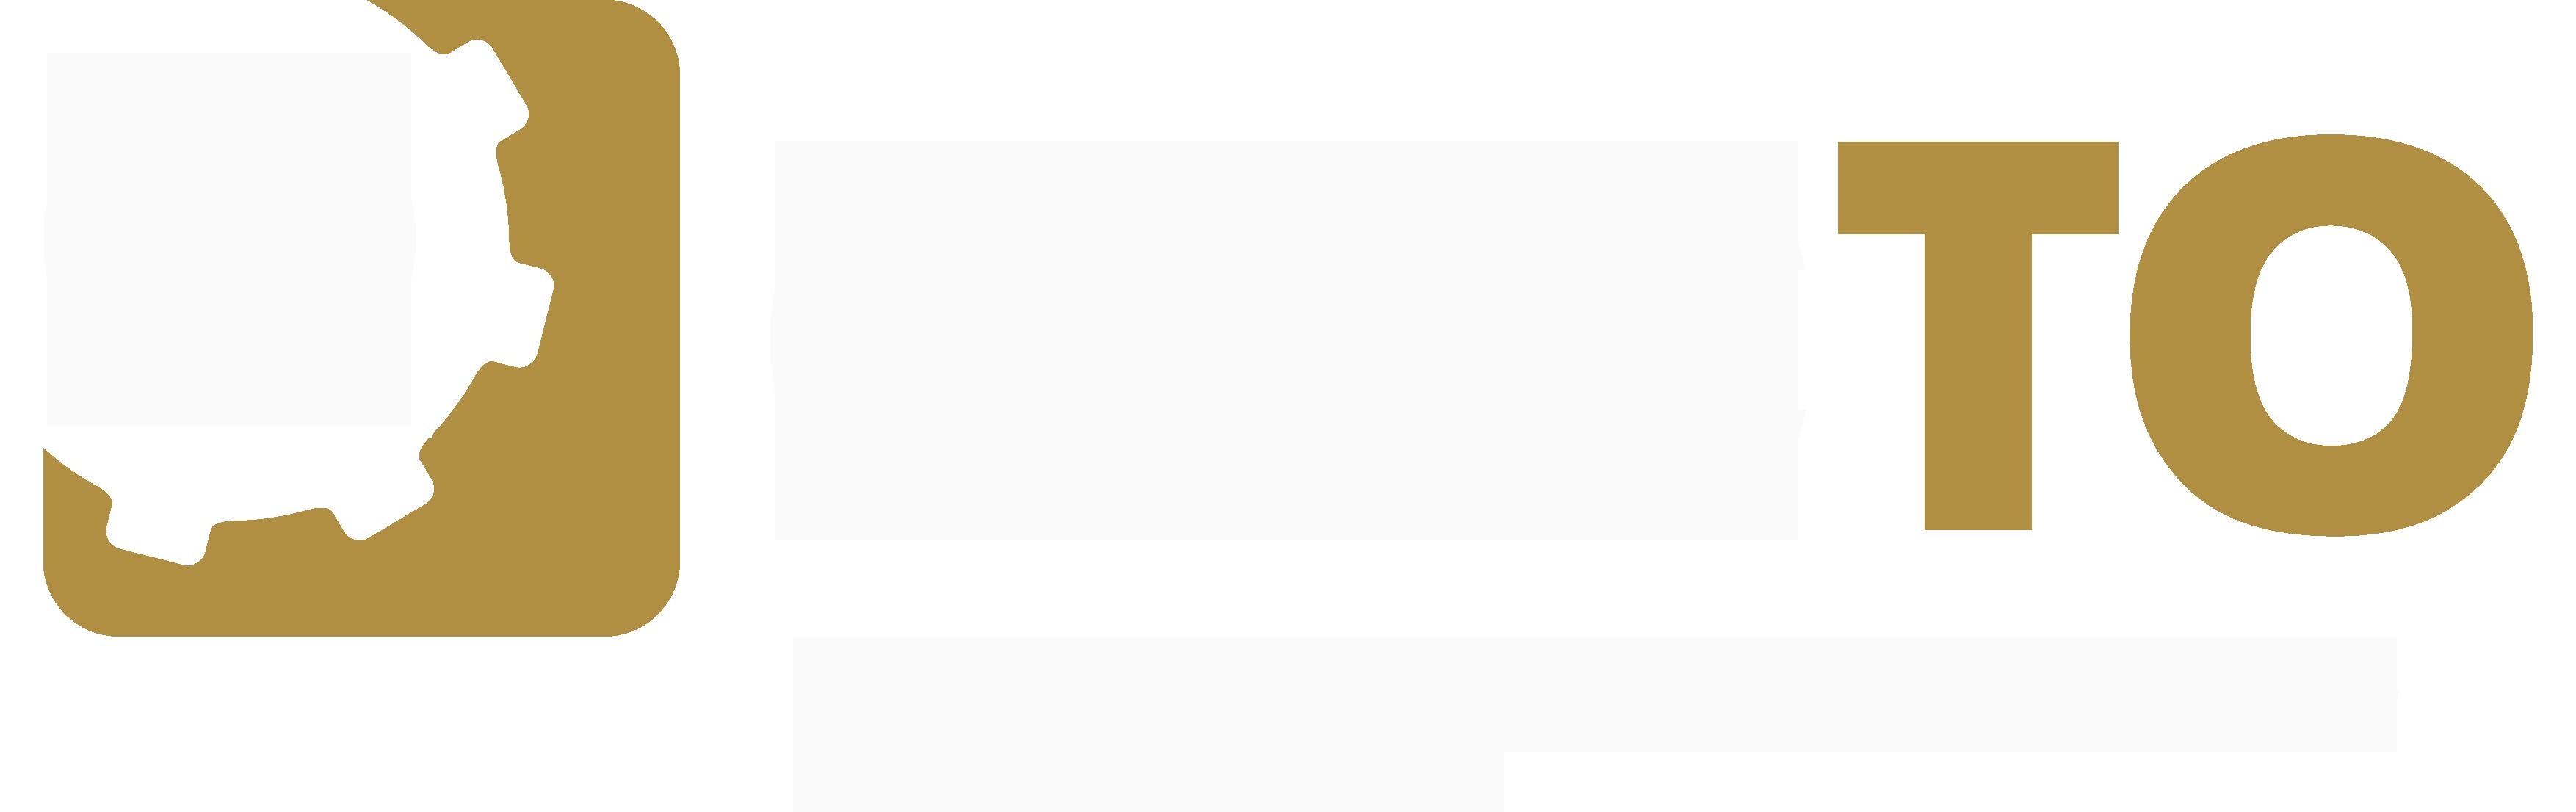 Logo do CFC